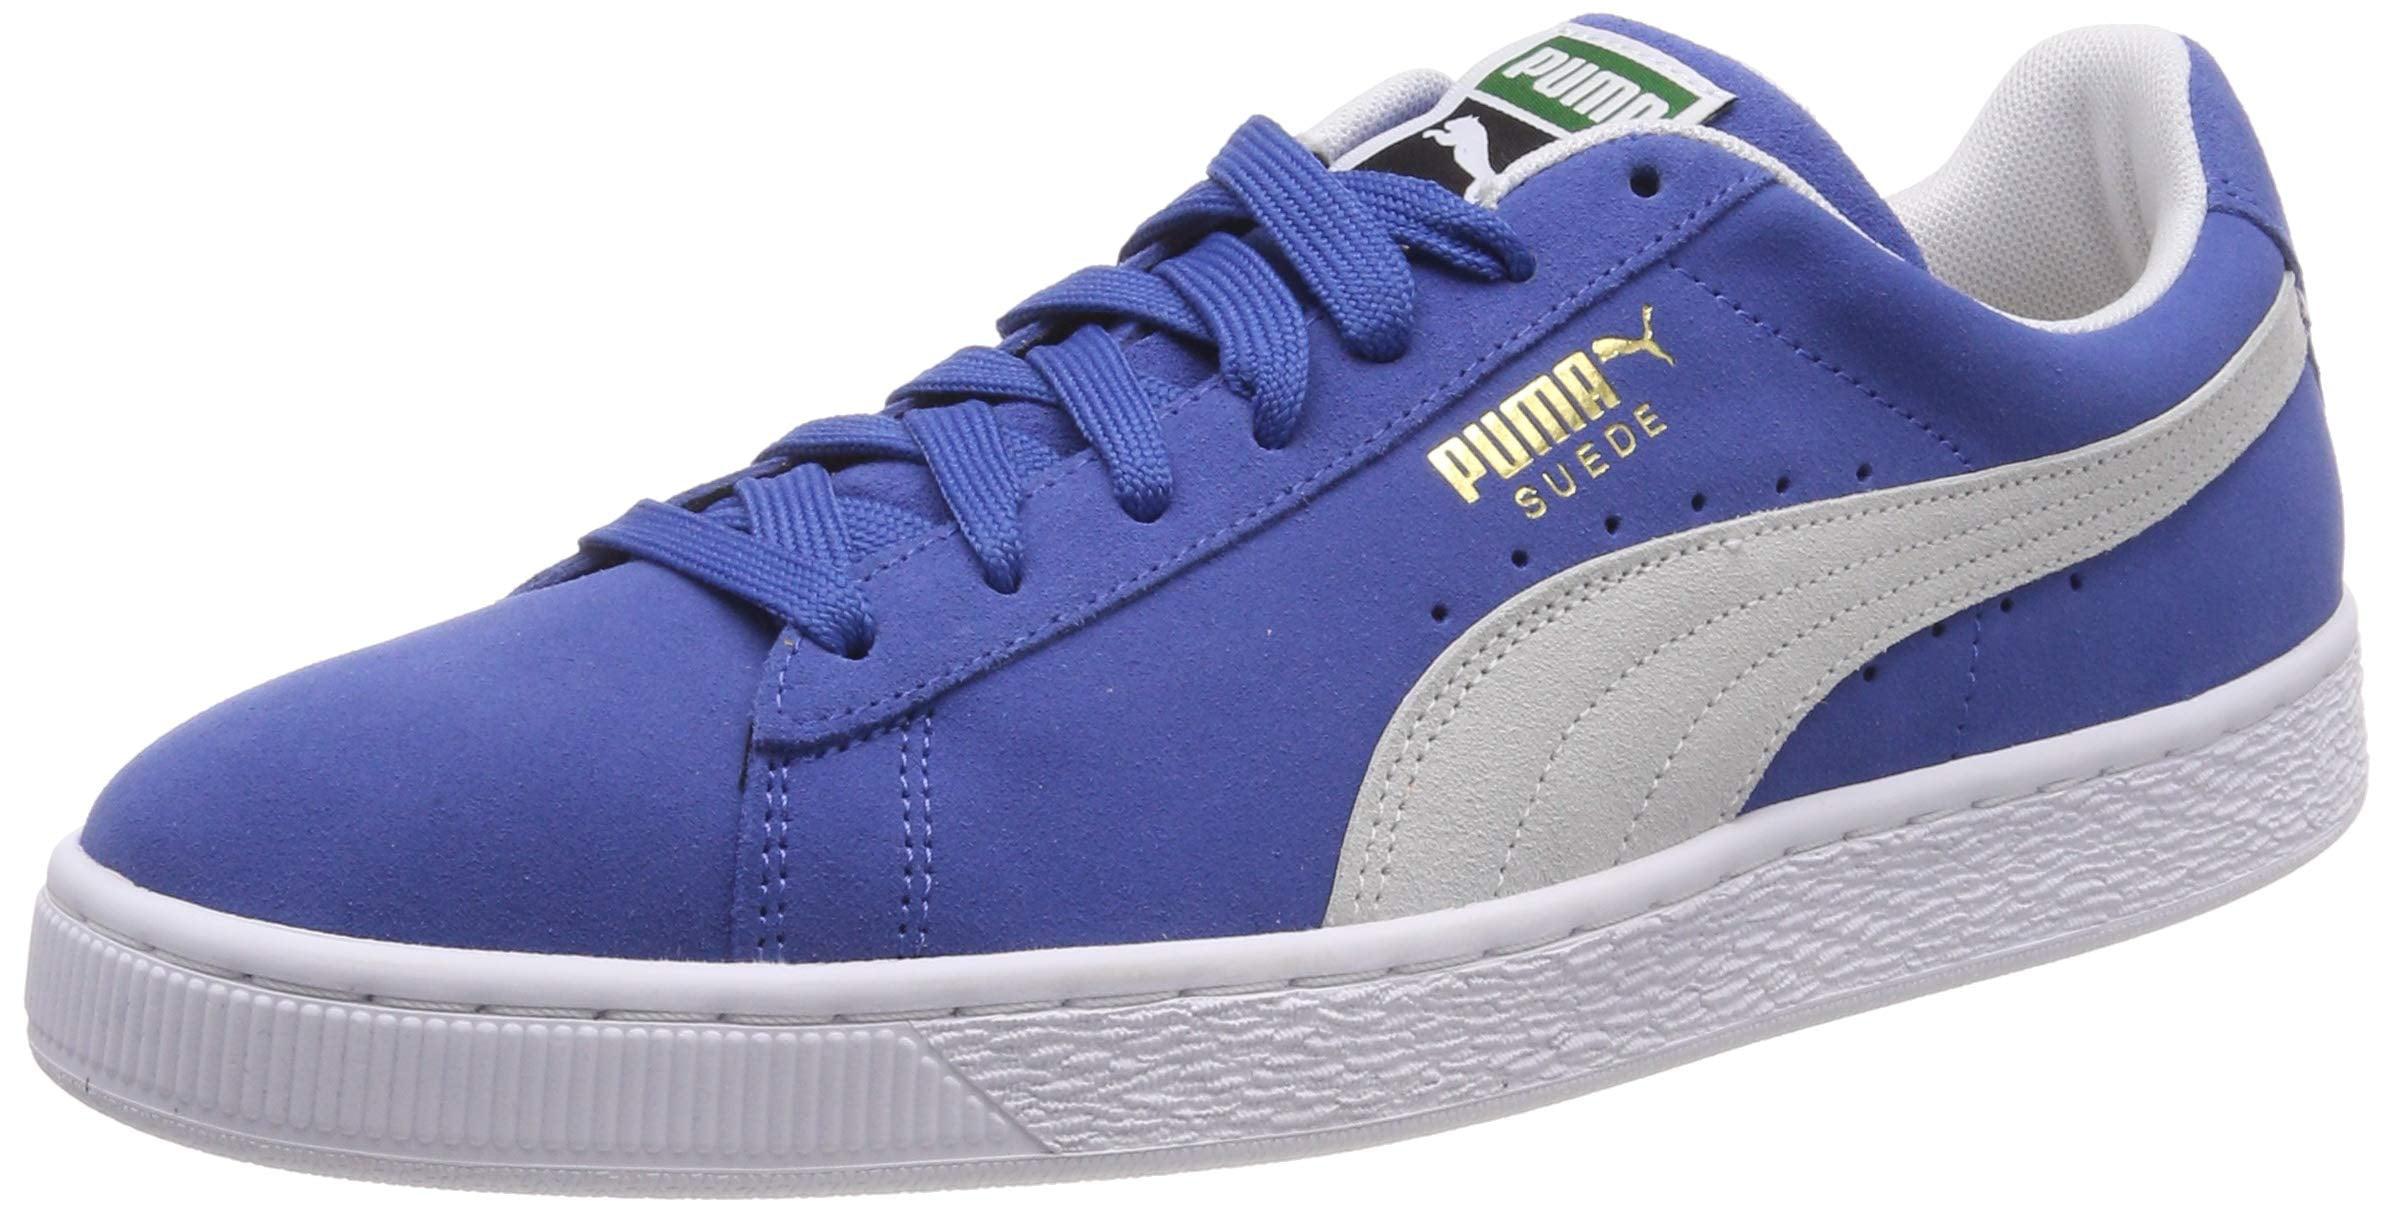 PUMA - Puma Men's Suede Classic Olympian Blue / White Ankle-High Fashion  Sneaker - 9M - Walmart.com